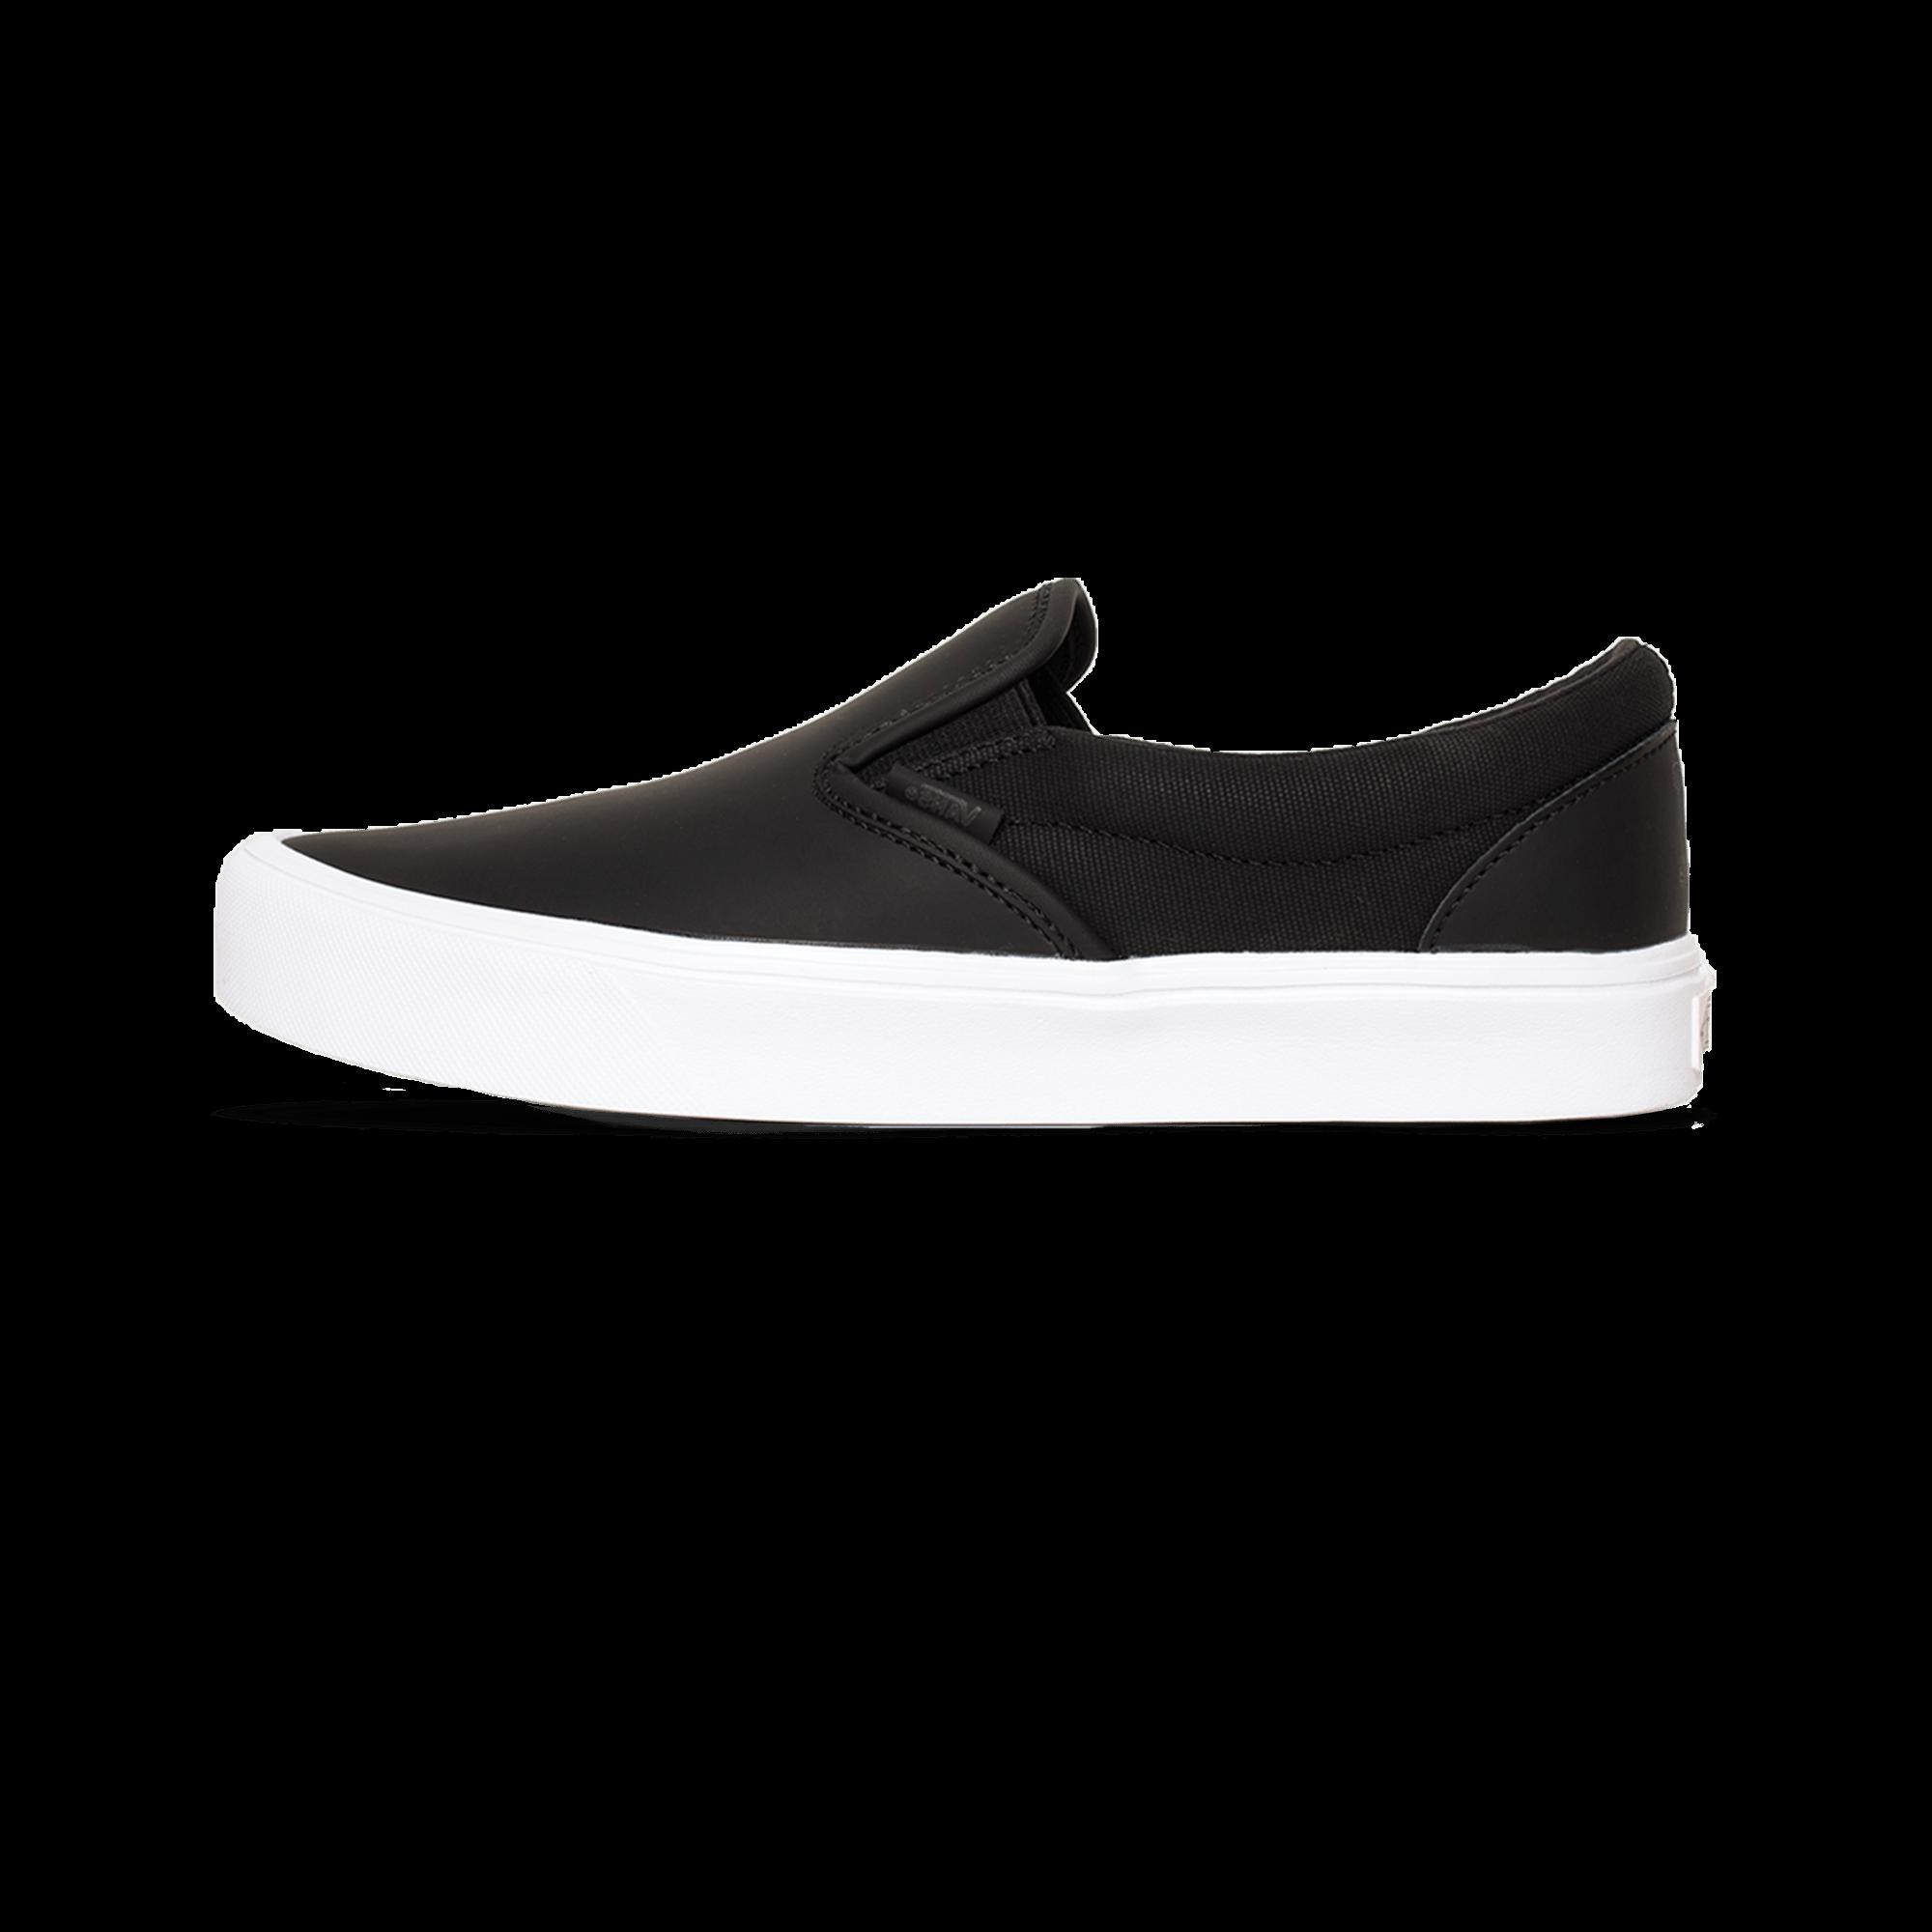 various design special sales on feet images of Vans Slip-On Lite